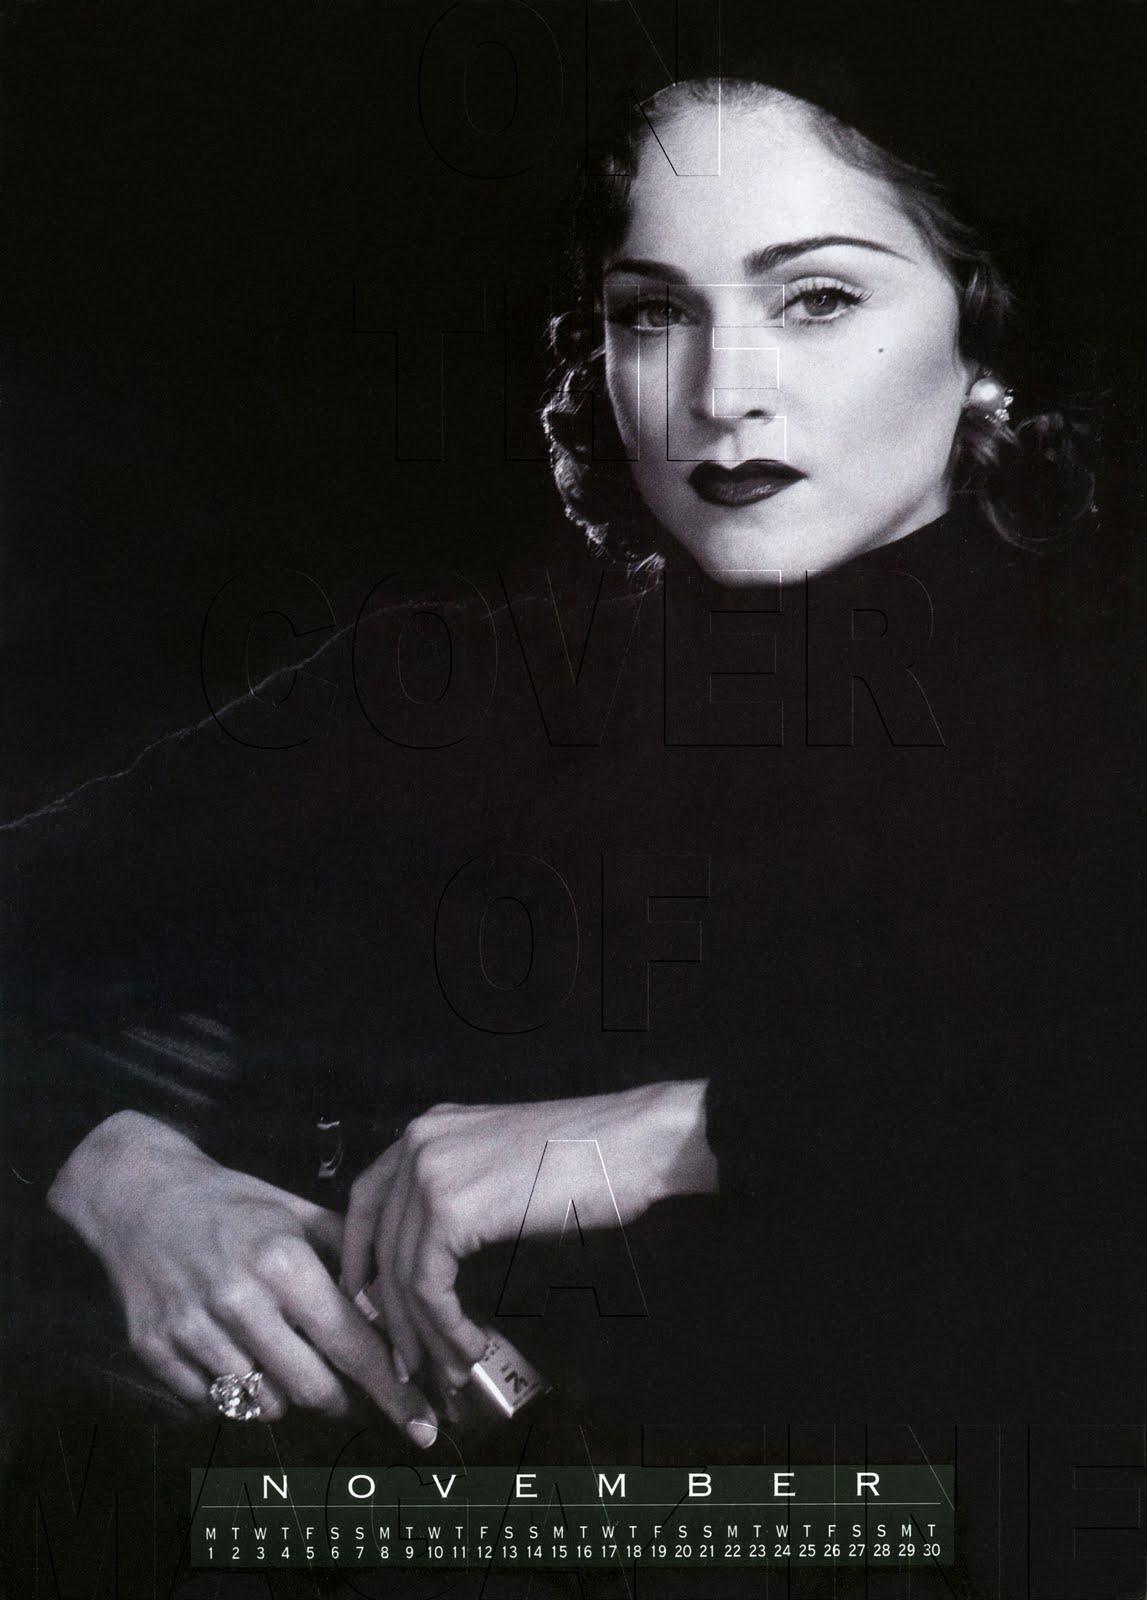 madonna   on the cover of a magazine otcoam rare madonna